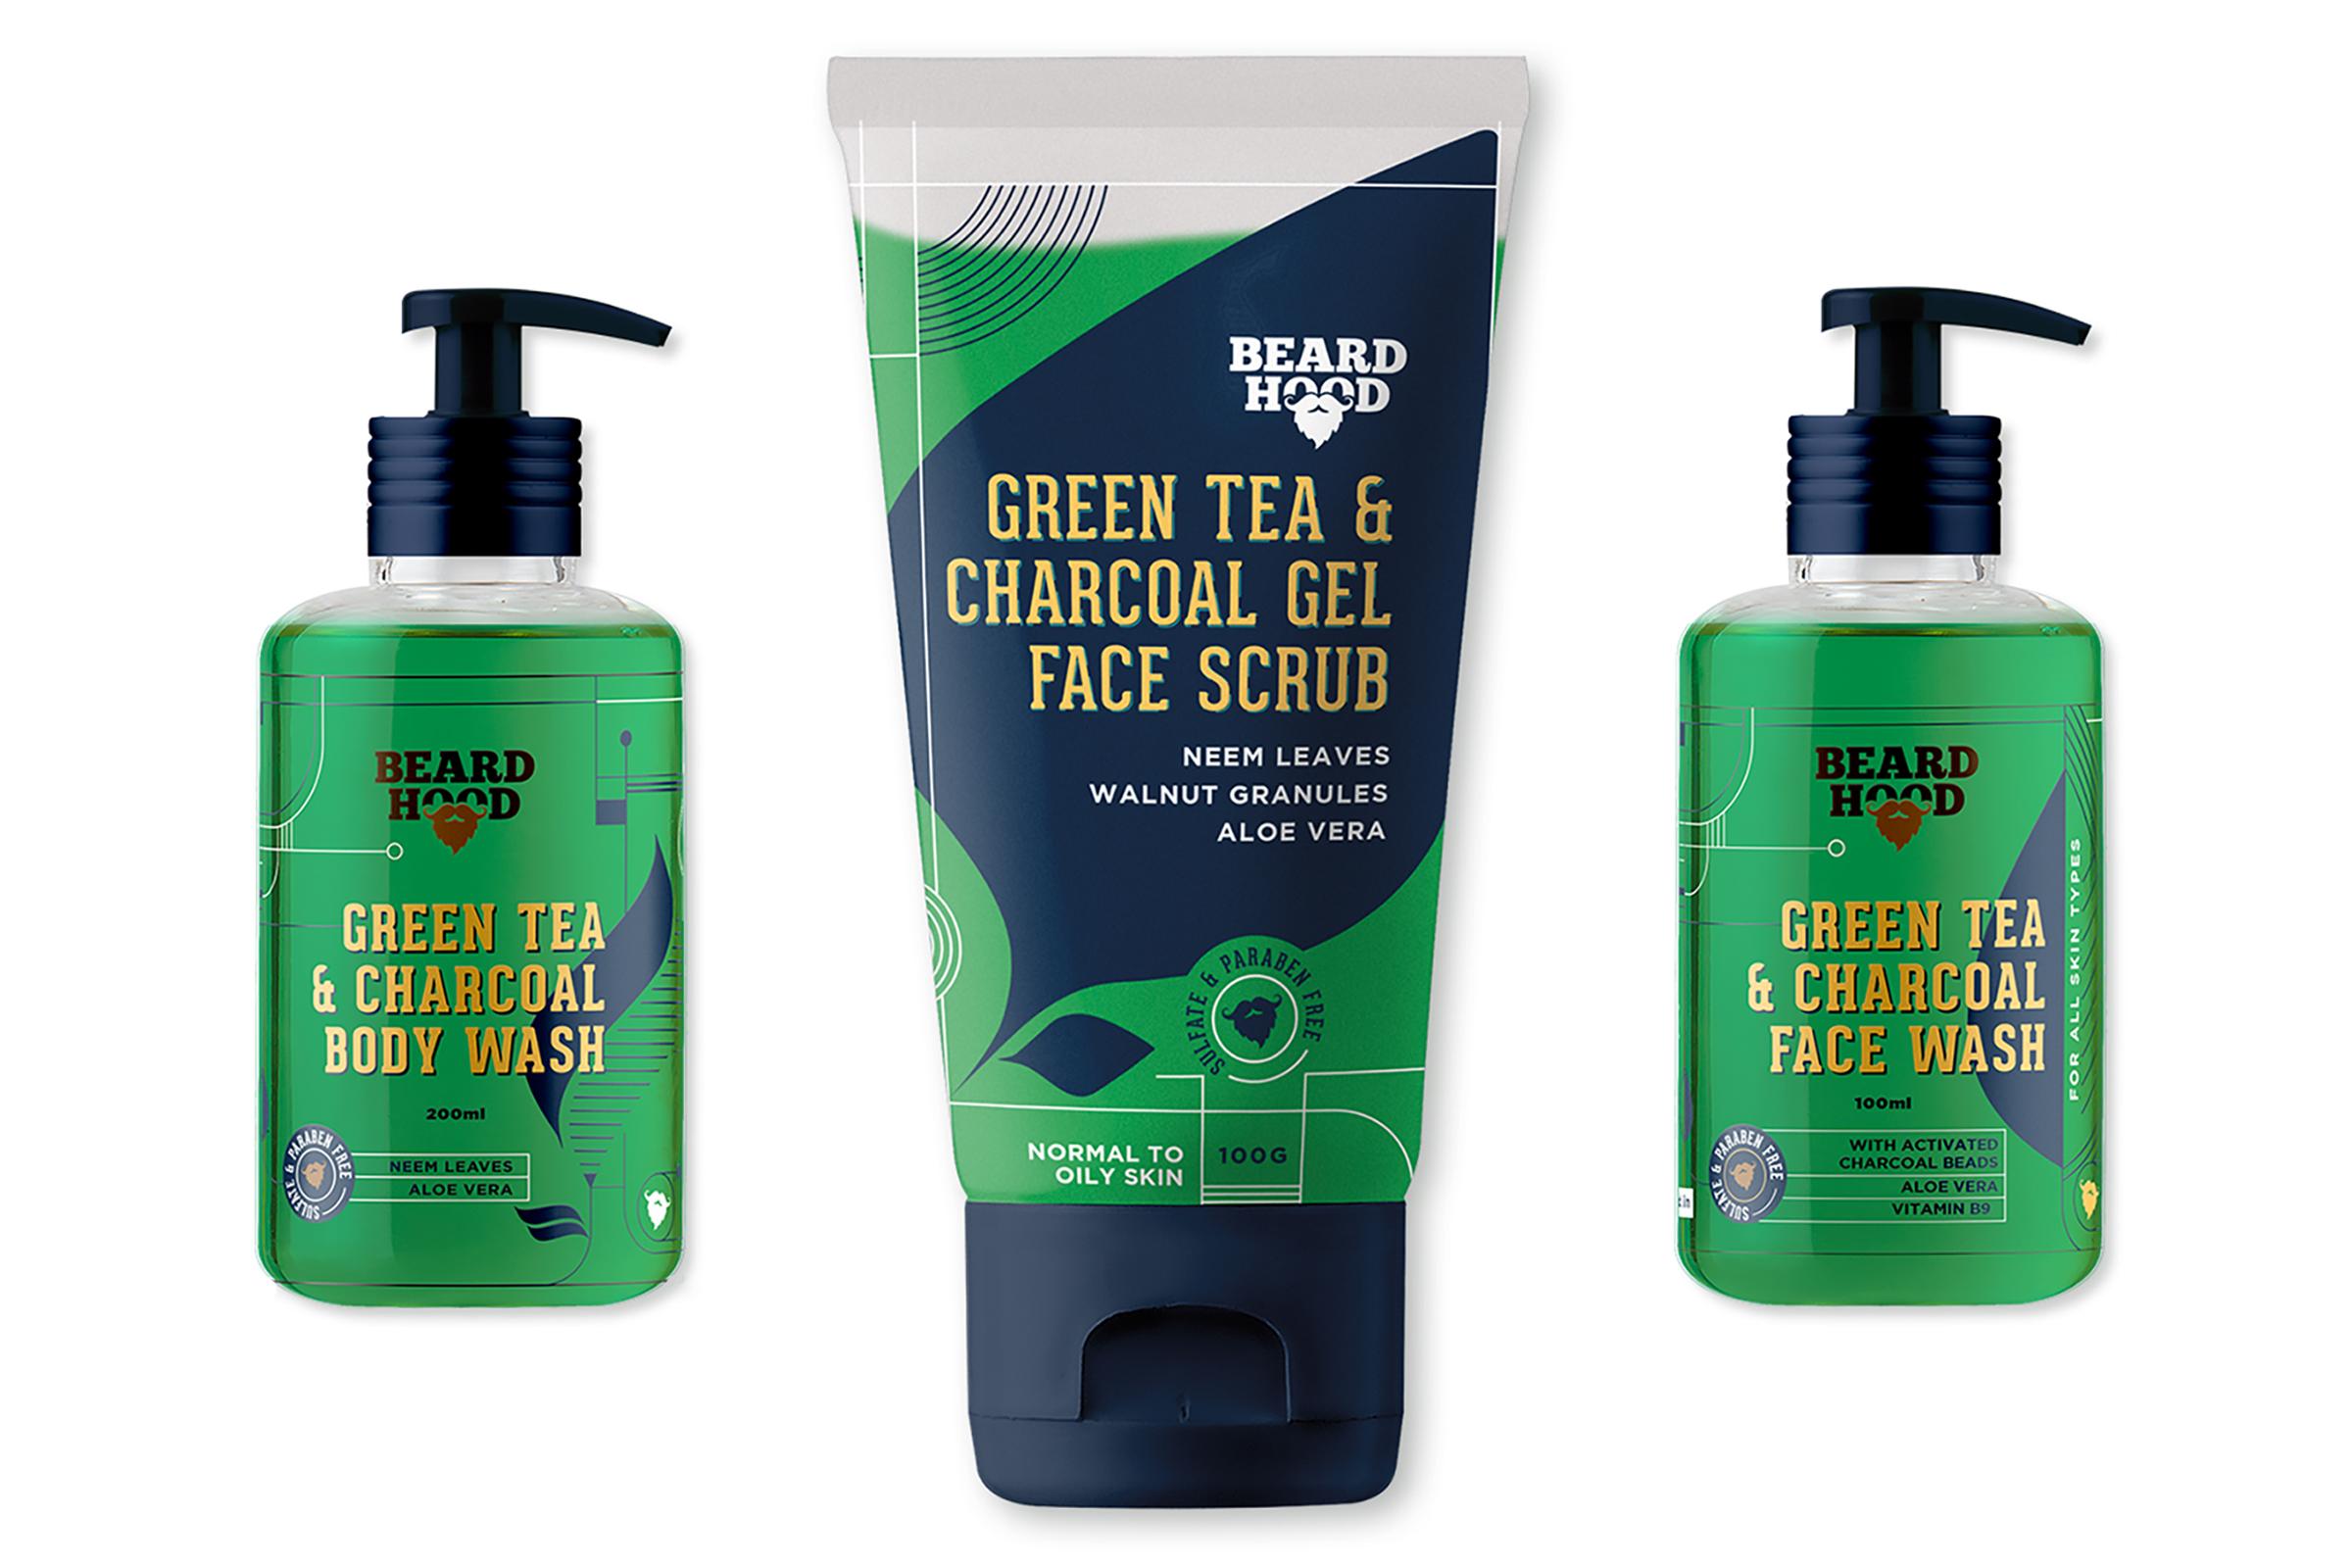 Stratedgy - Beard Hood Brand Project9.jpg